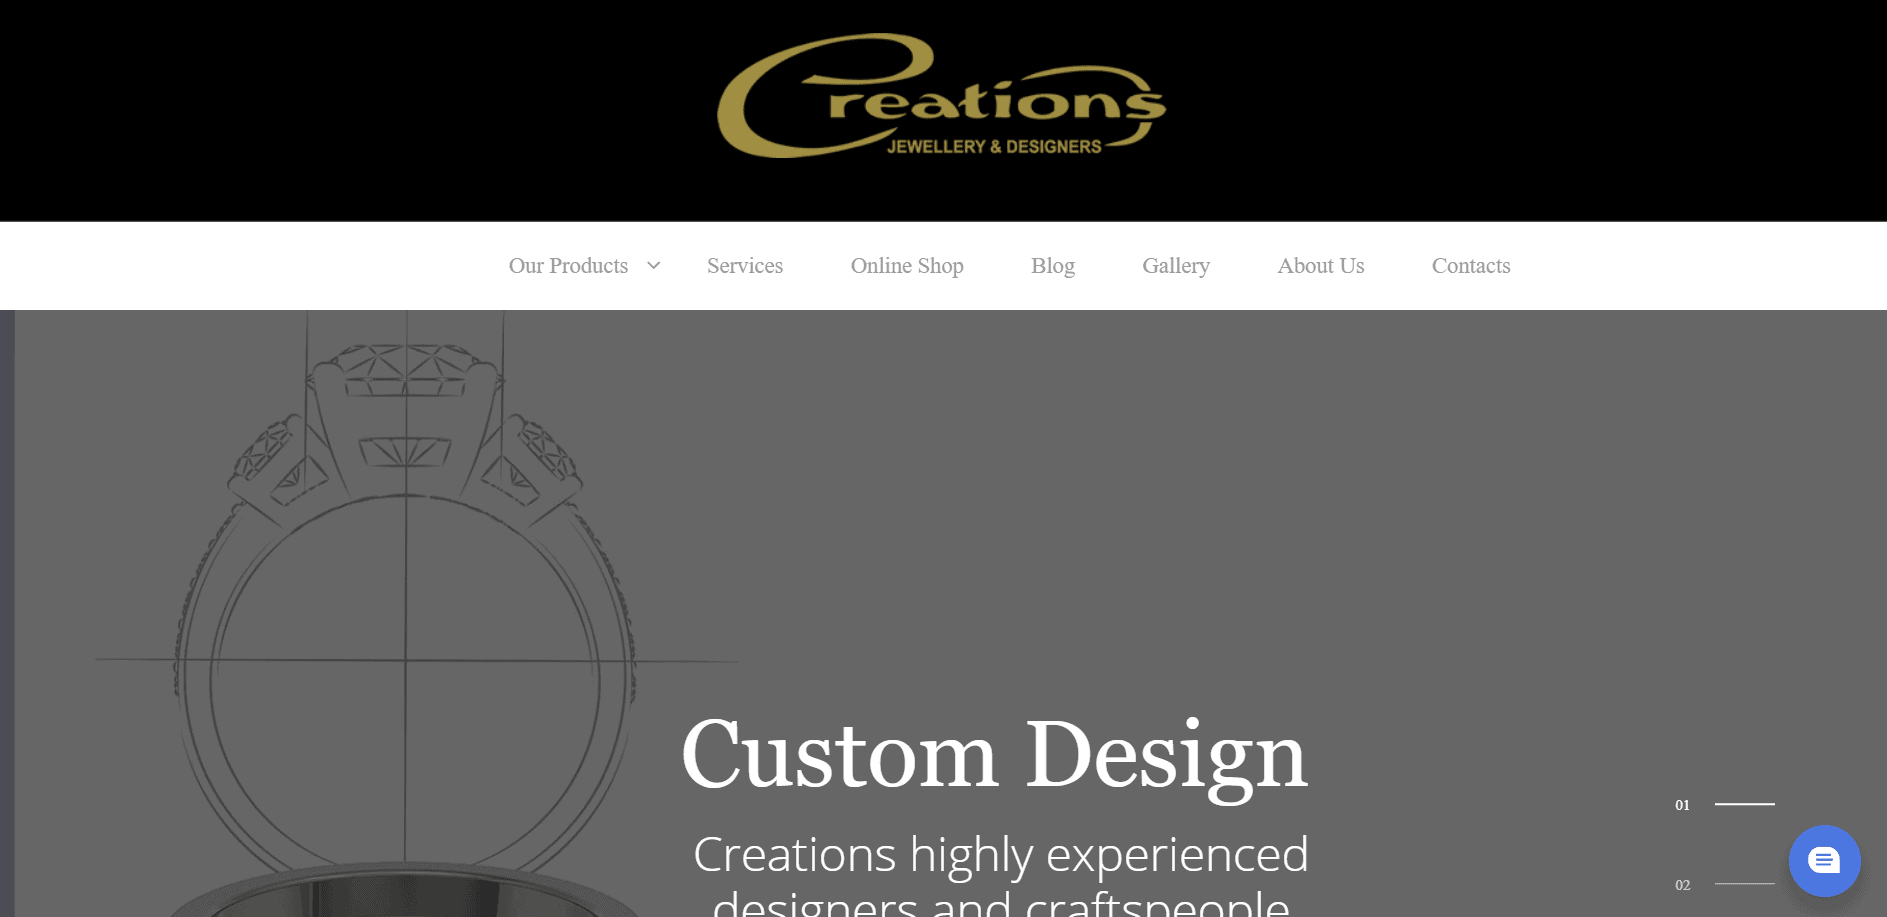 Creations Jewellery & Designers